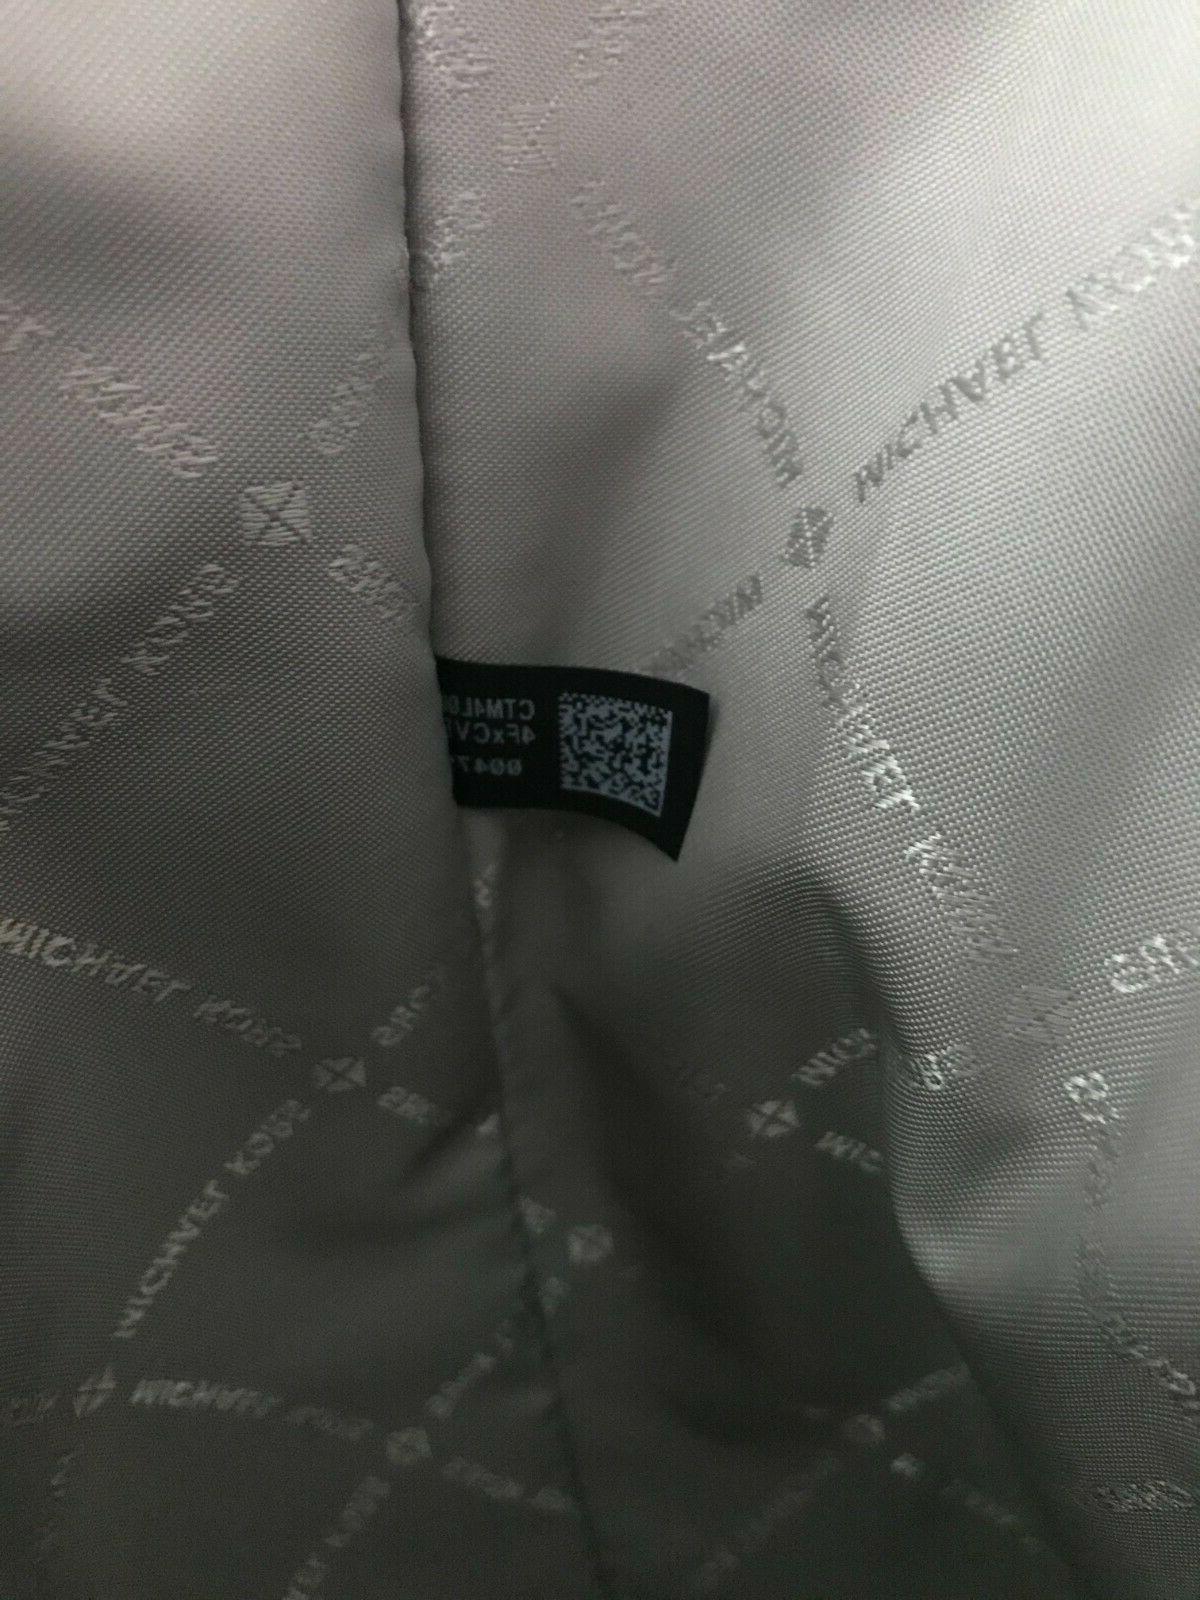 NWT Michael Kors Jet Set Leather Tote Bag Purse